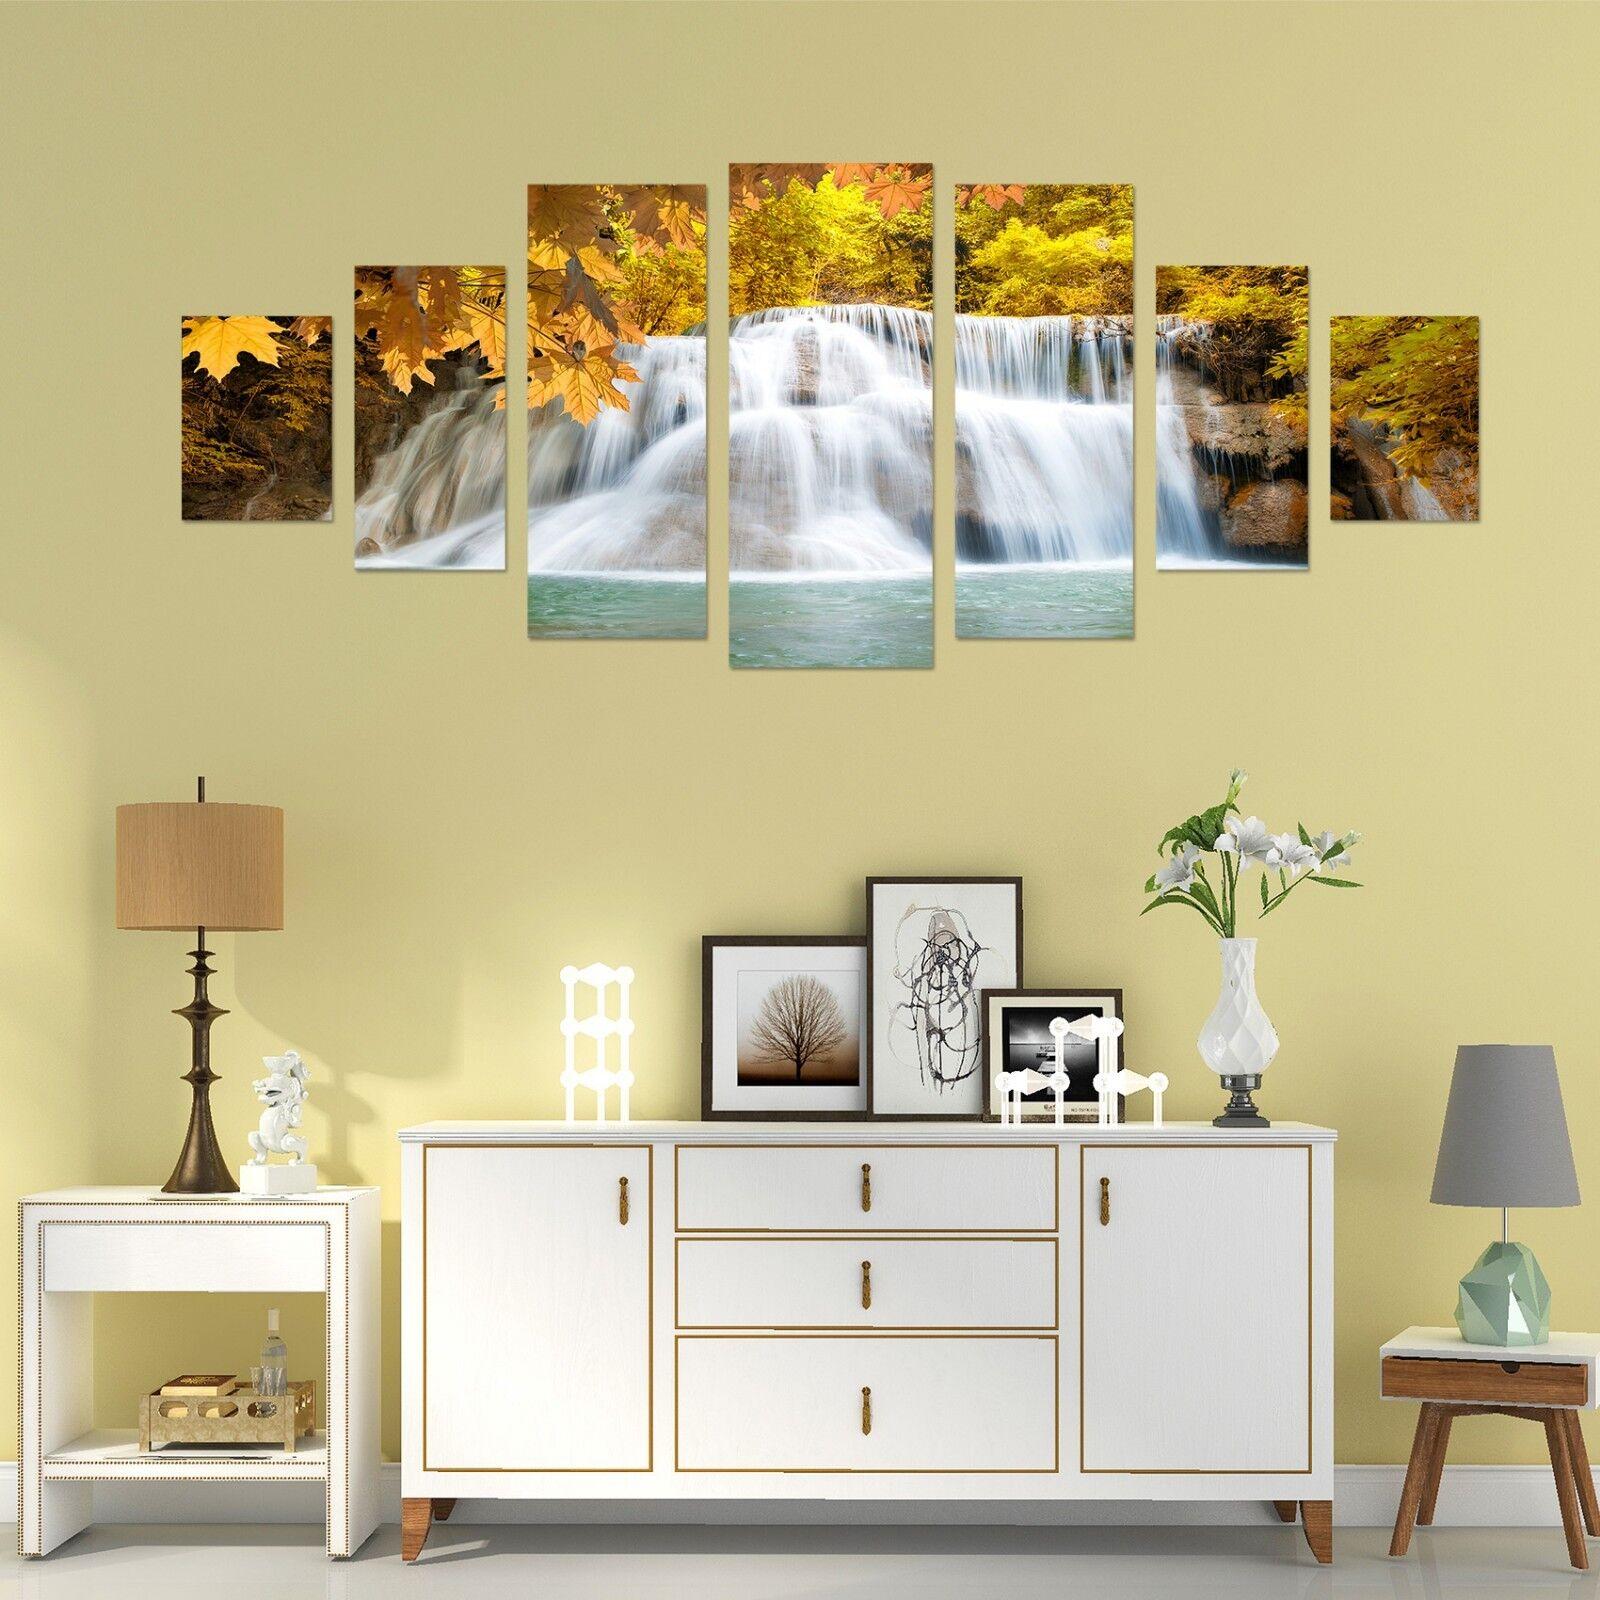 3D Leaf Waterfall 566 Unframed Print Wall Paper Decal Wall Deco Indoor AJ Wall